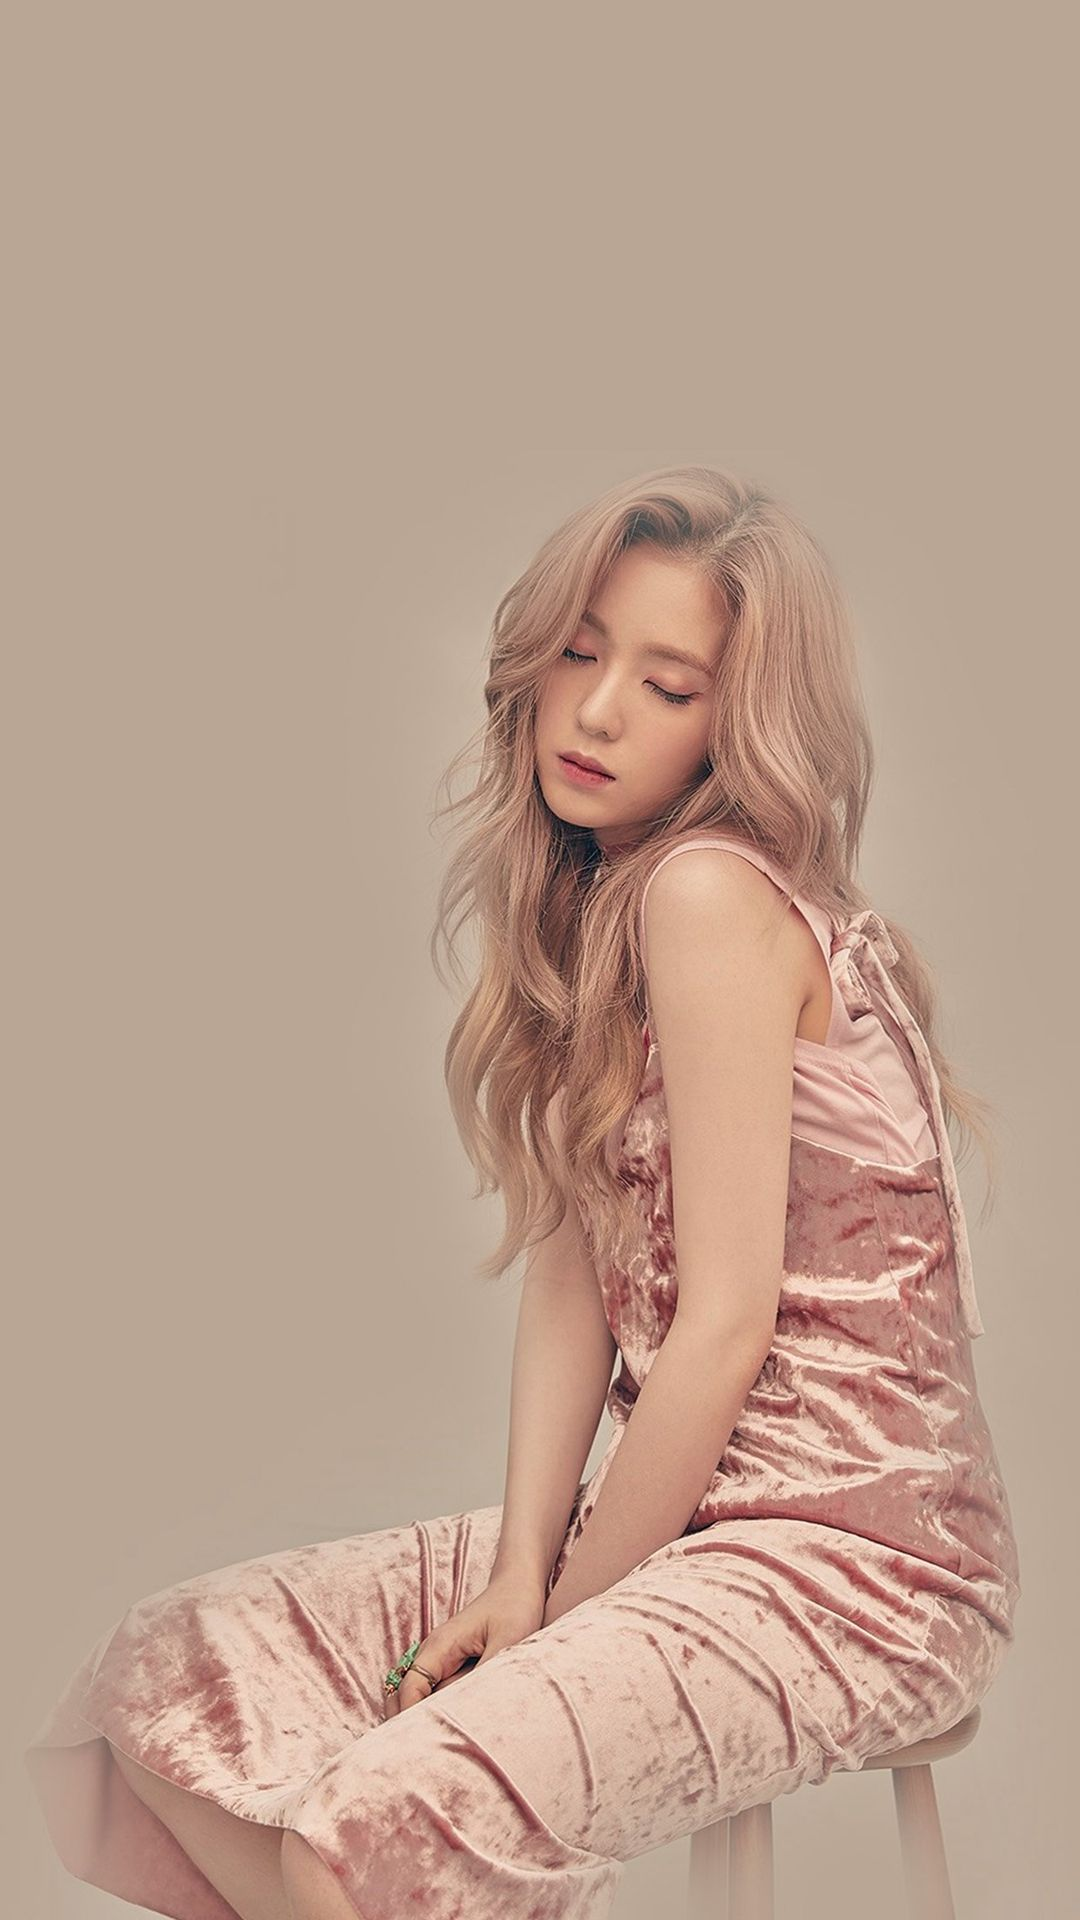 Irene Kpop Redvelvet Pink Girl Iphone 6 Plus Wallpaper Velvet Wallpaper Red Velvet Irene Pink Girl